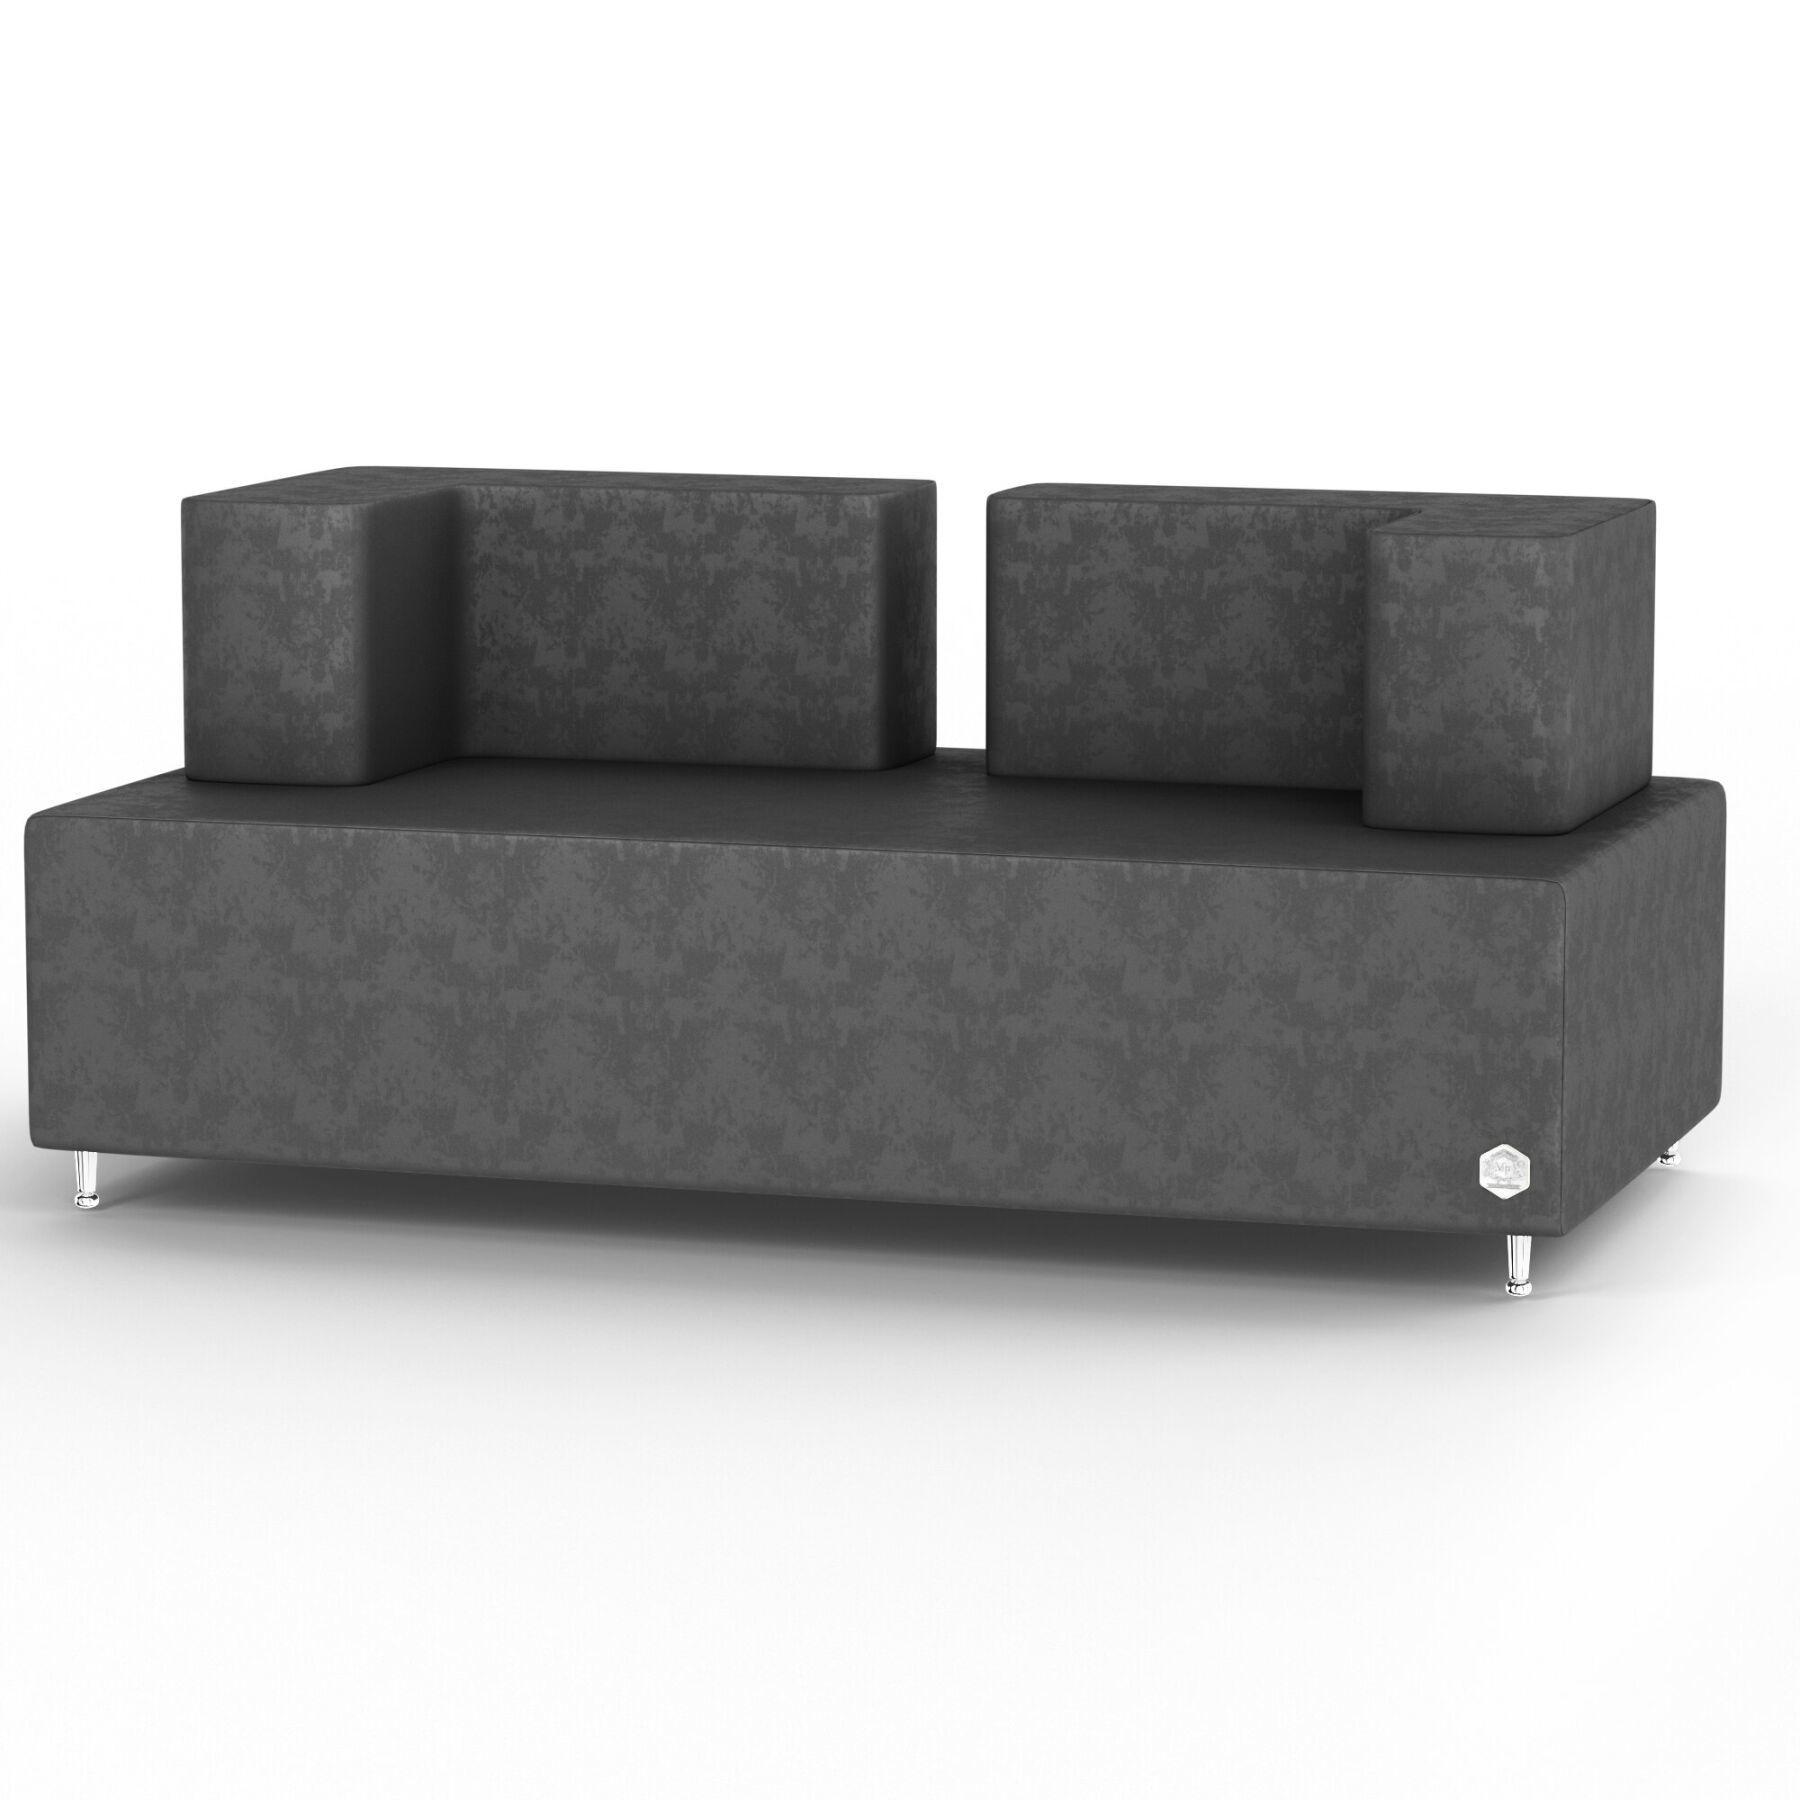 Двухместный диван KULIK SYSTEM BASE Антара Целый